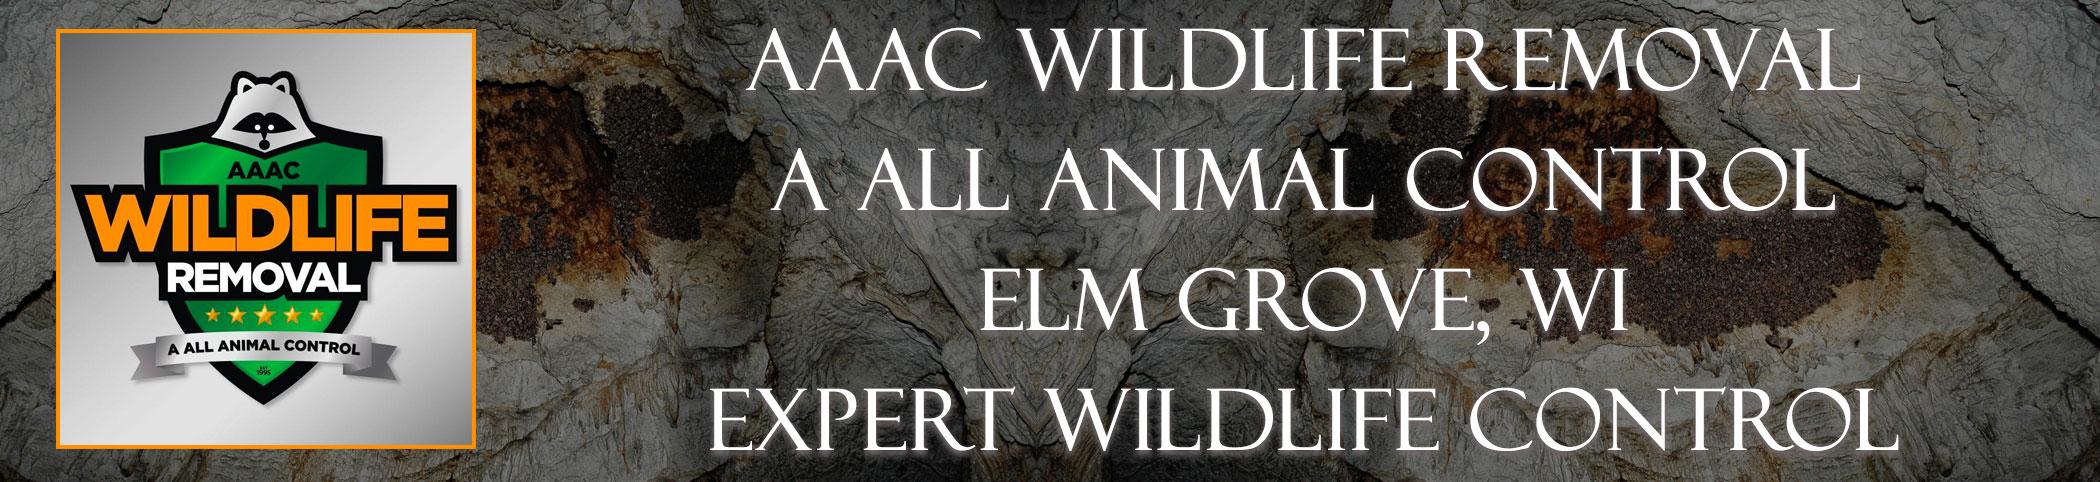 aaac-wildlife-removal-Elm Grove-wisconsin